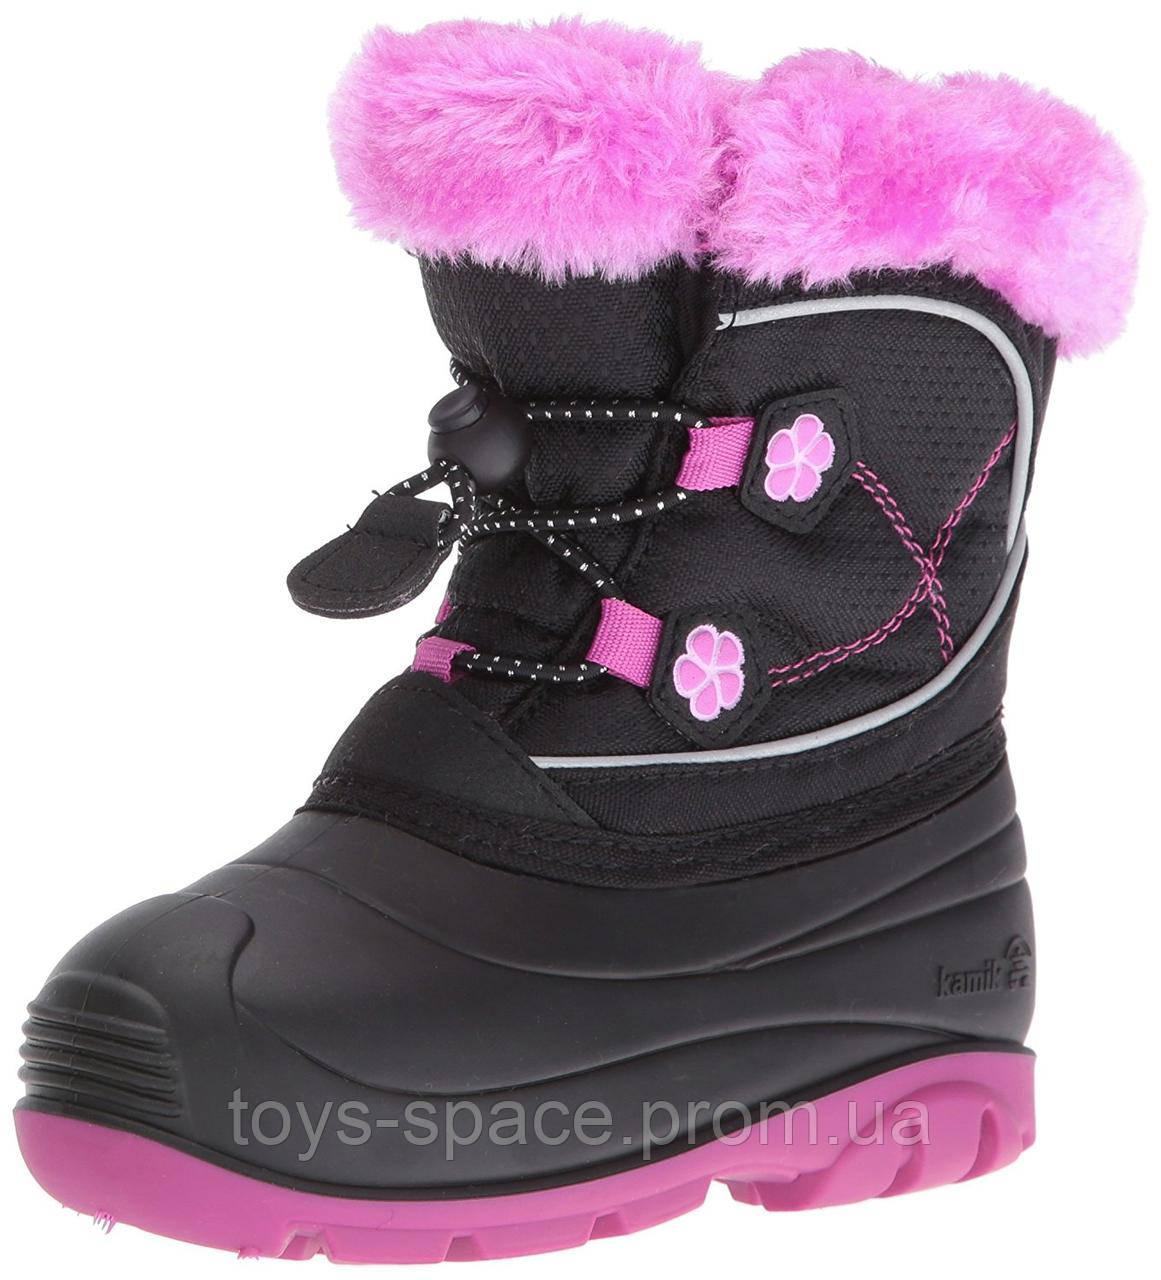 62c1e6566 Зимние Детские Сапоги Kamik Kids' Pebble Snow Boot 10US — в ...